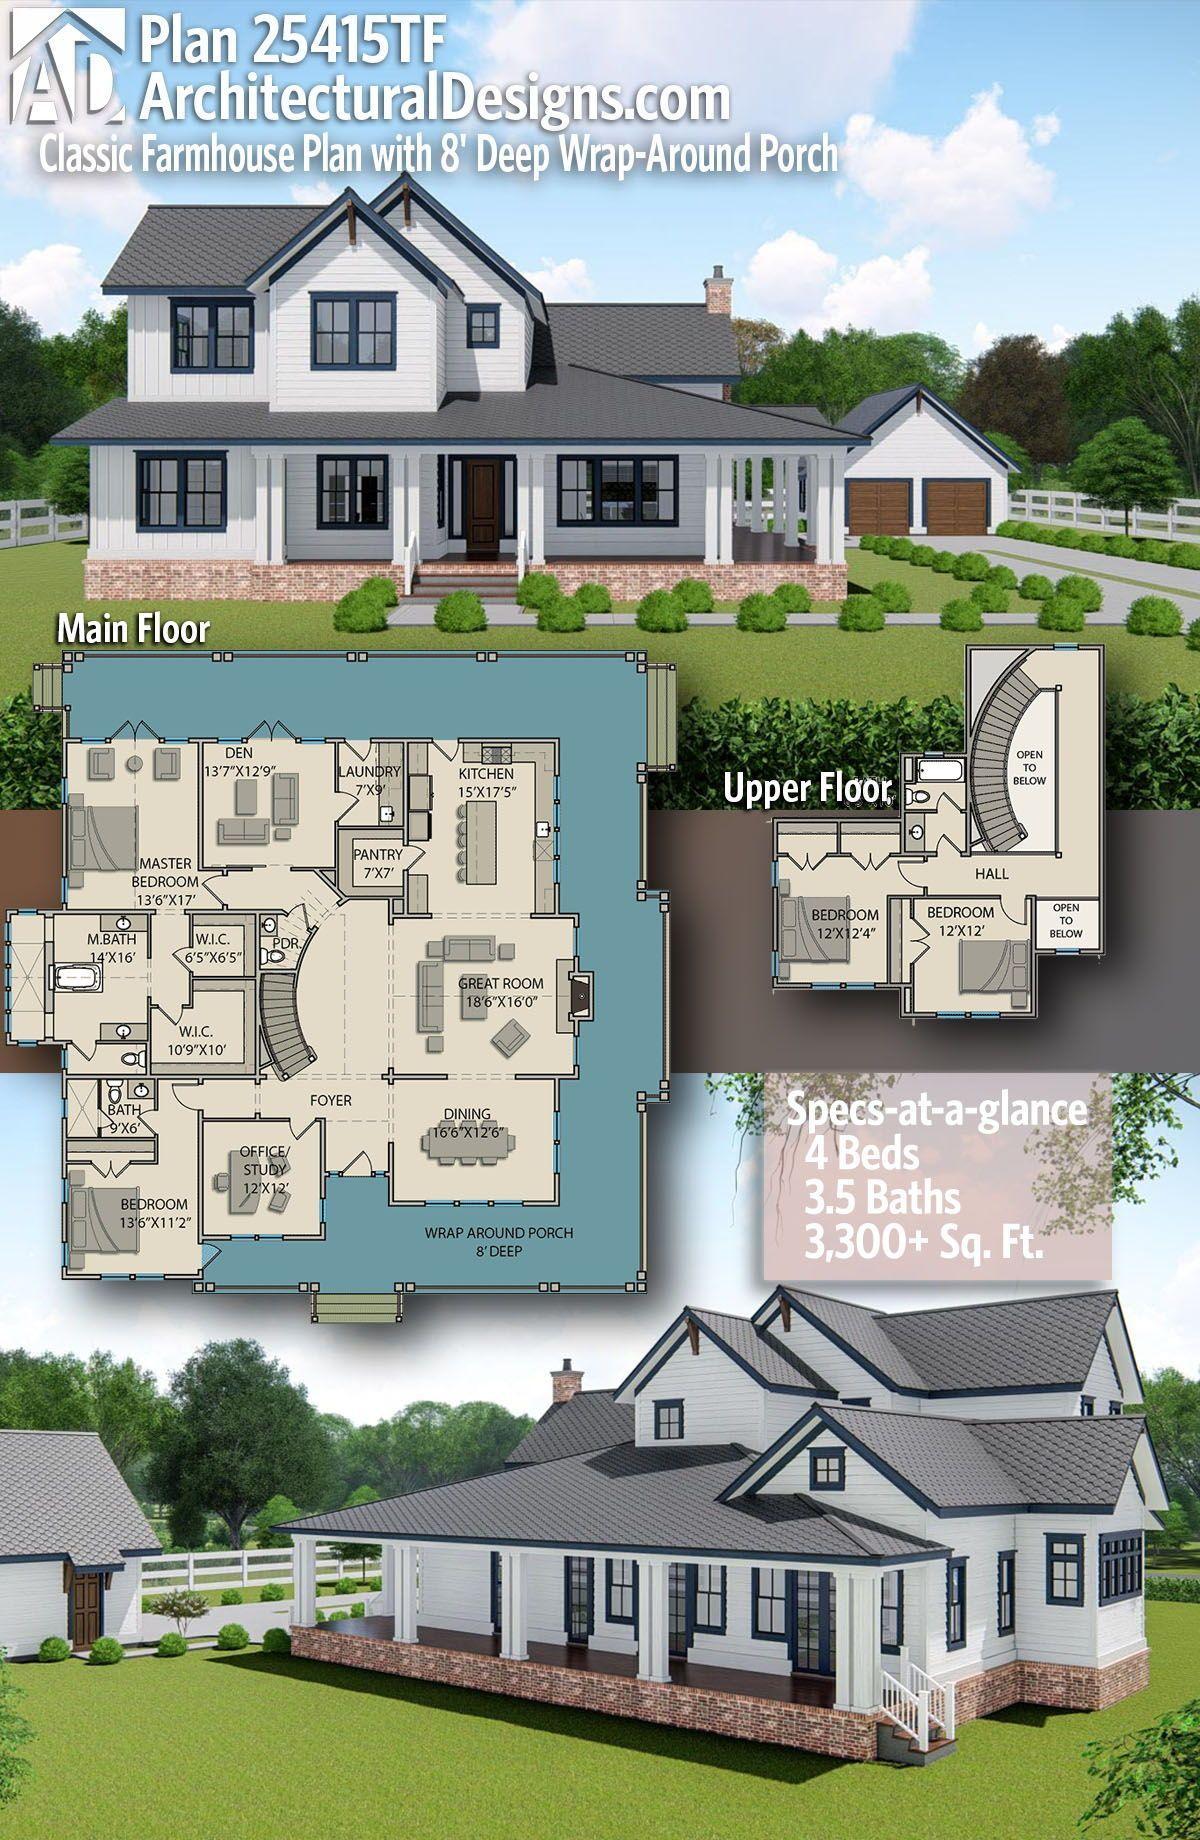 Plan 25415tf Classic Farmhouse Plan With 8 Decoration Homedecor Homedesign Homeideas Farmhouse Plans House Plans Farmhouse Dream House Plans